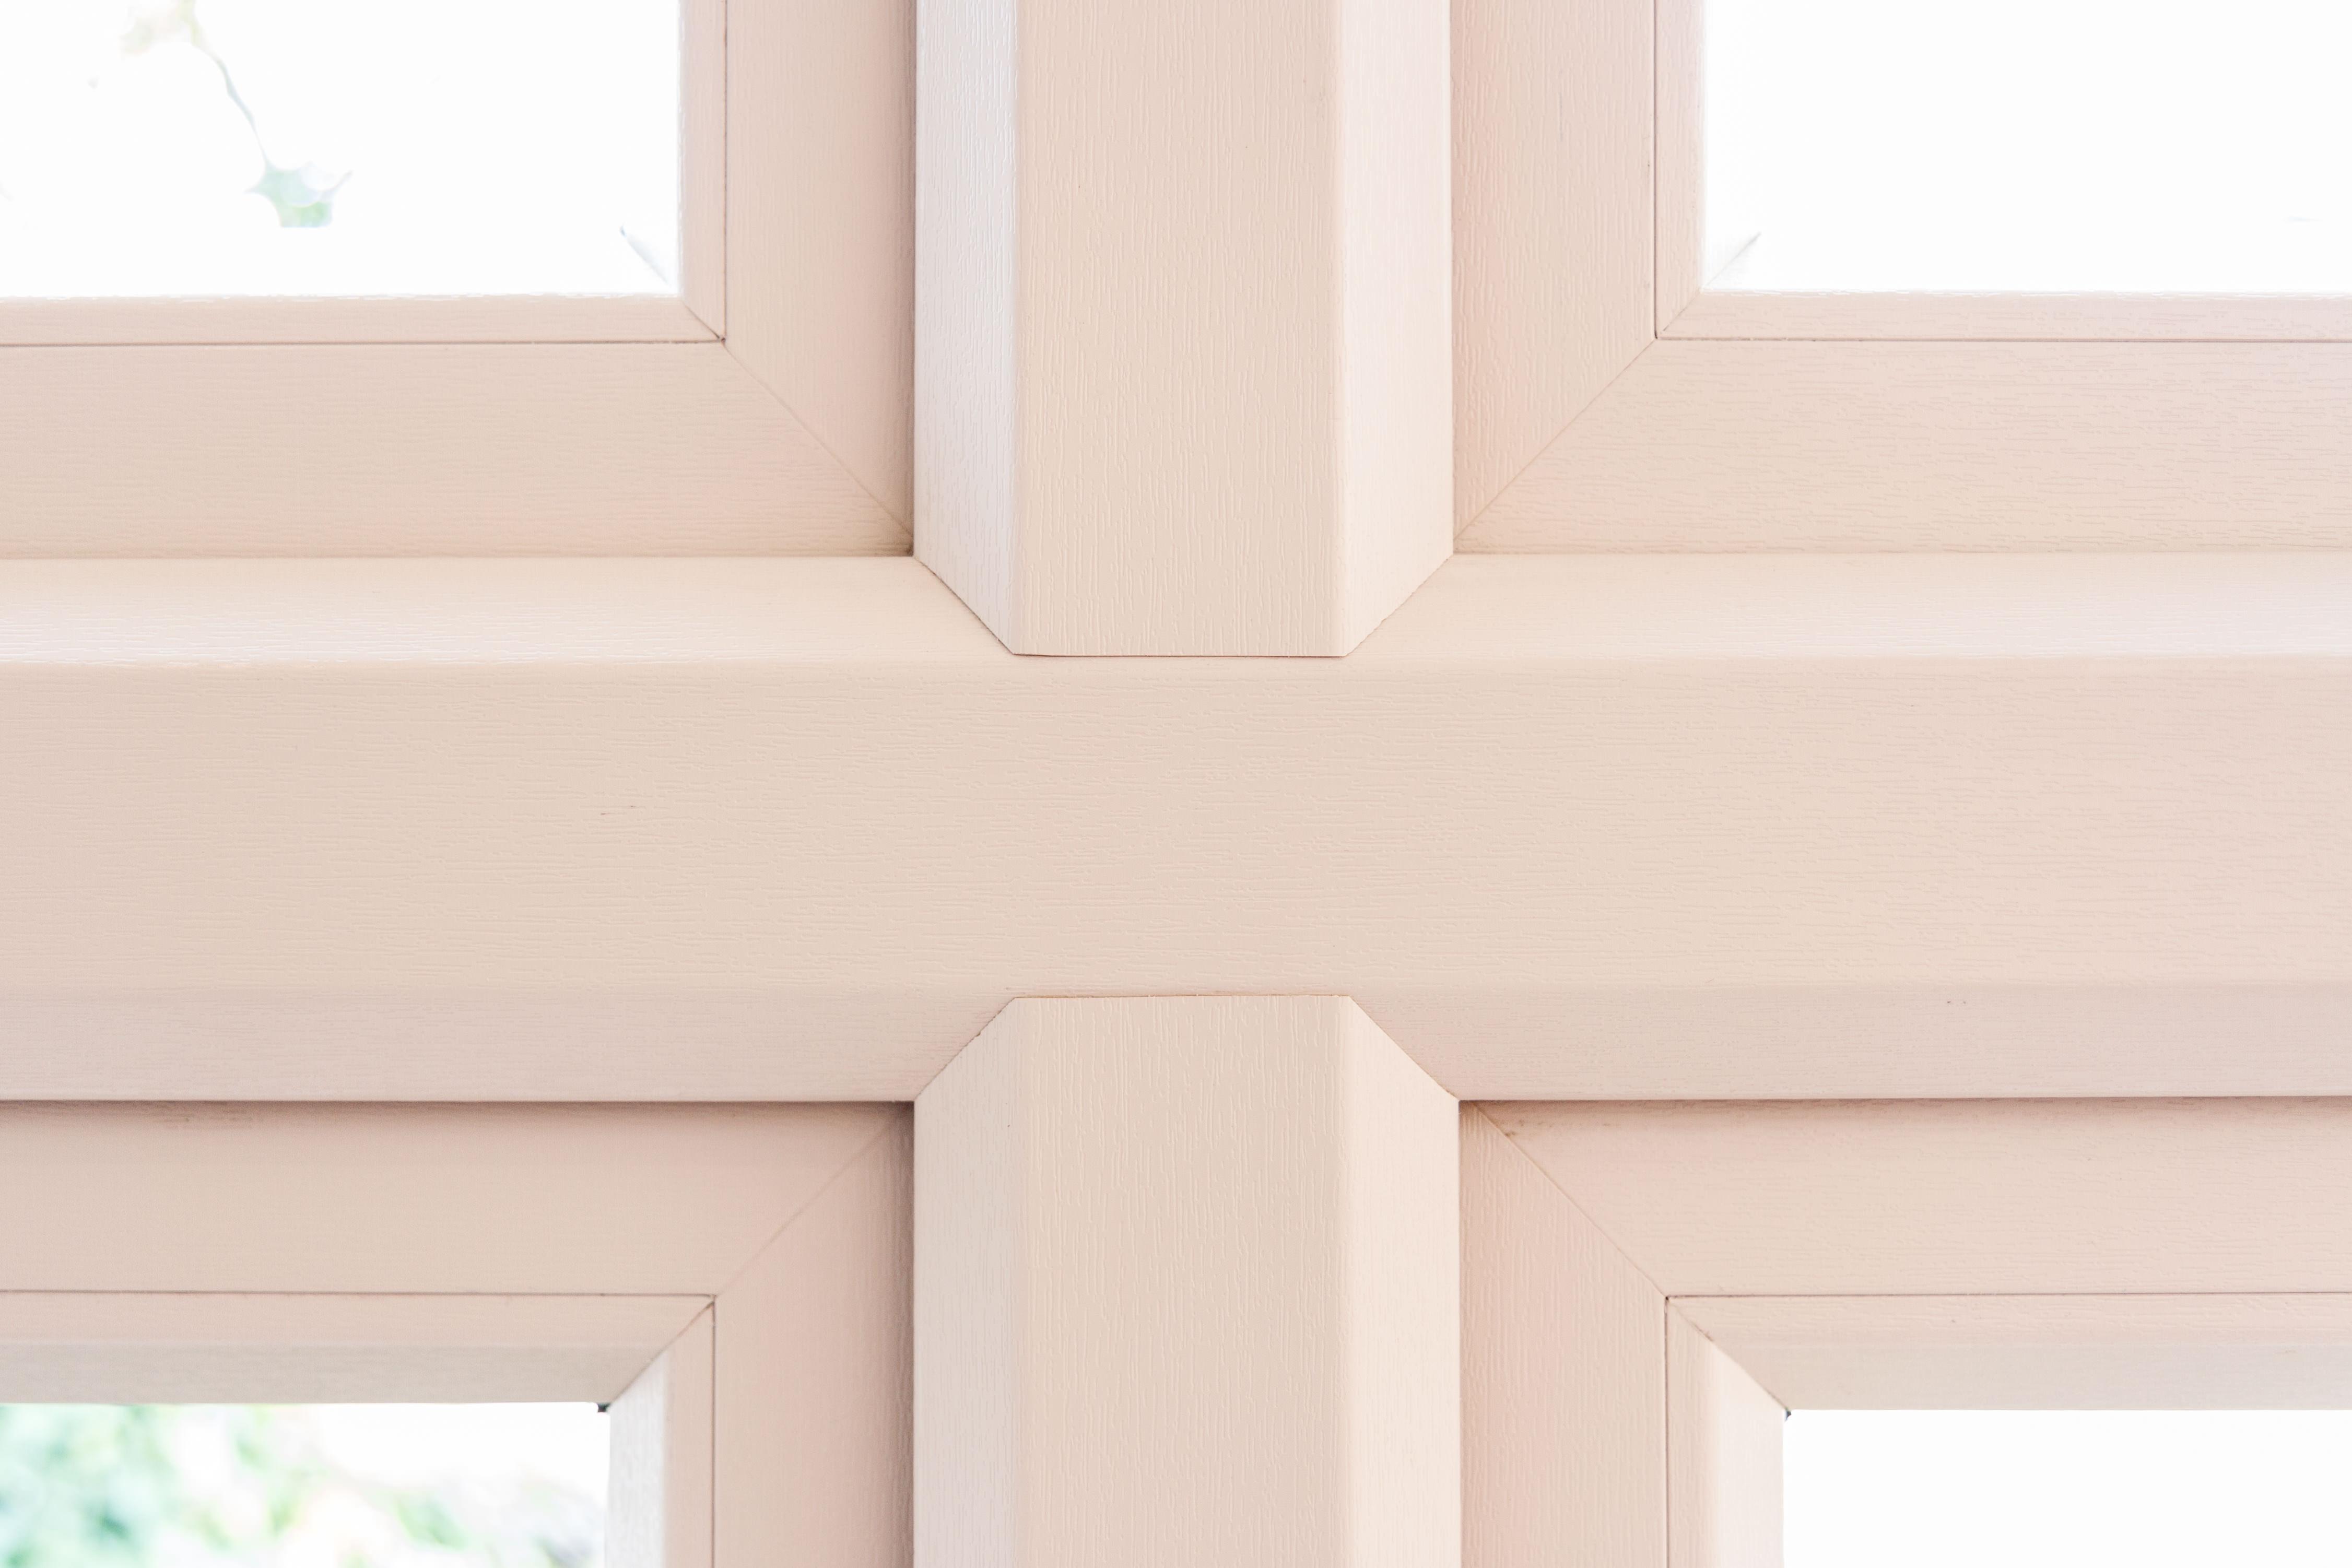 Double glazing prices in yeadon double glazed windows for Double glazing uk